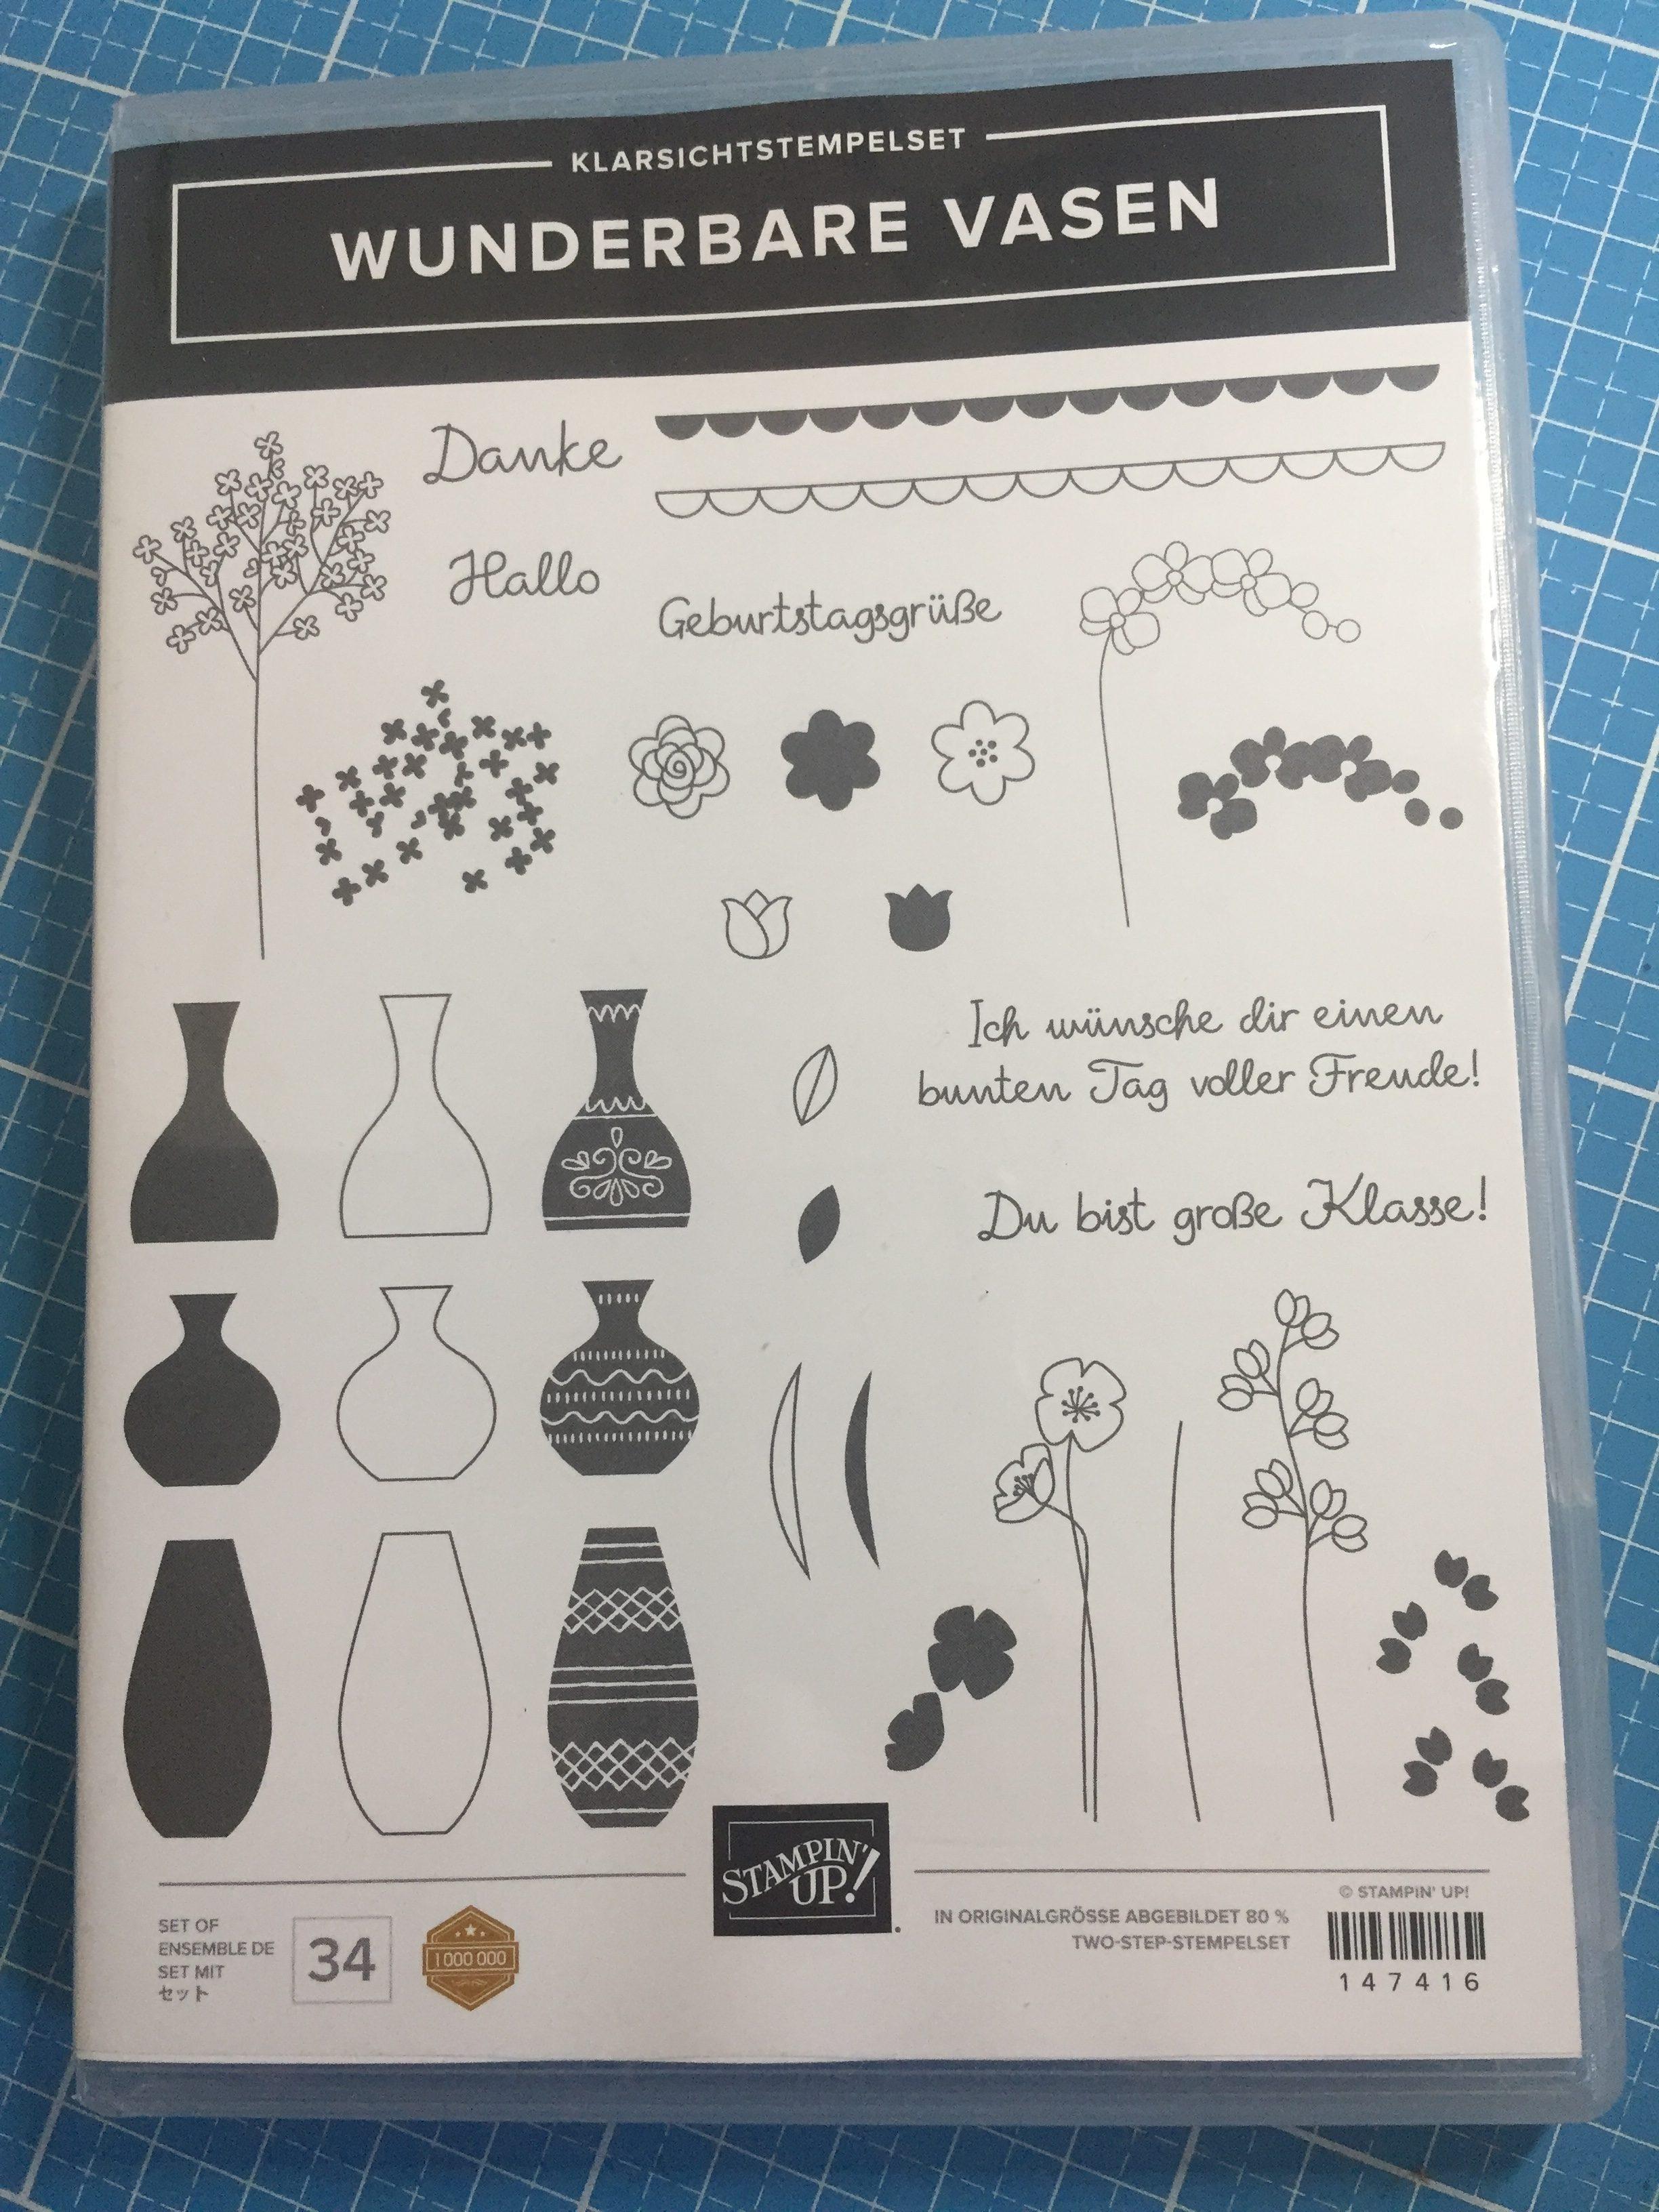 wunderbare Vasen Stampin up